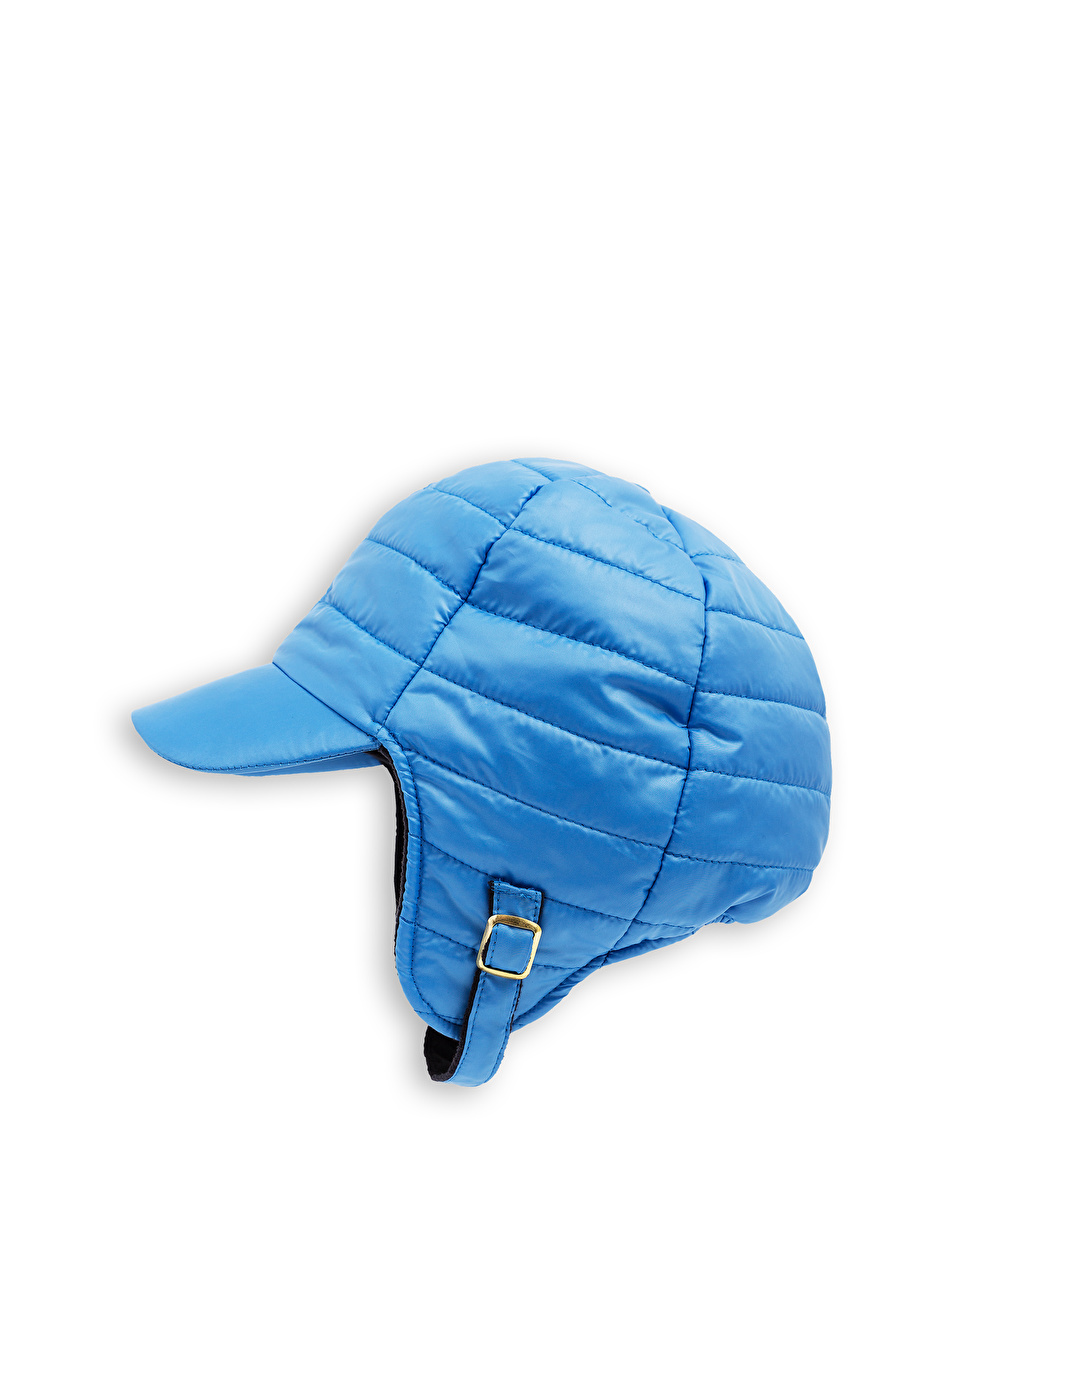 1776512050-3-mini-rodini-insulator-cap-light-blue